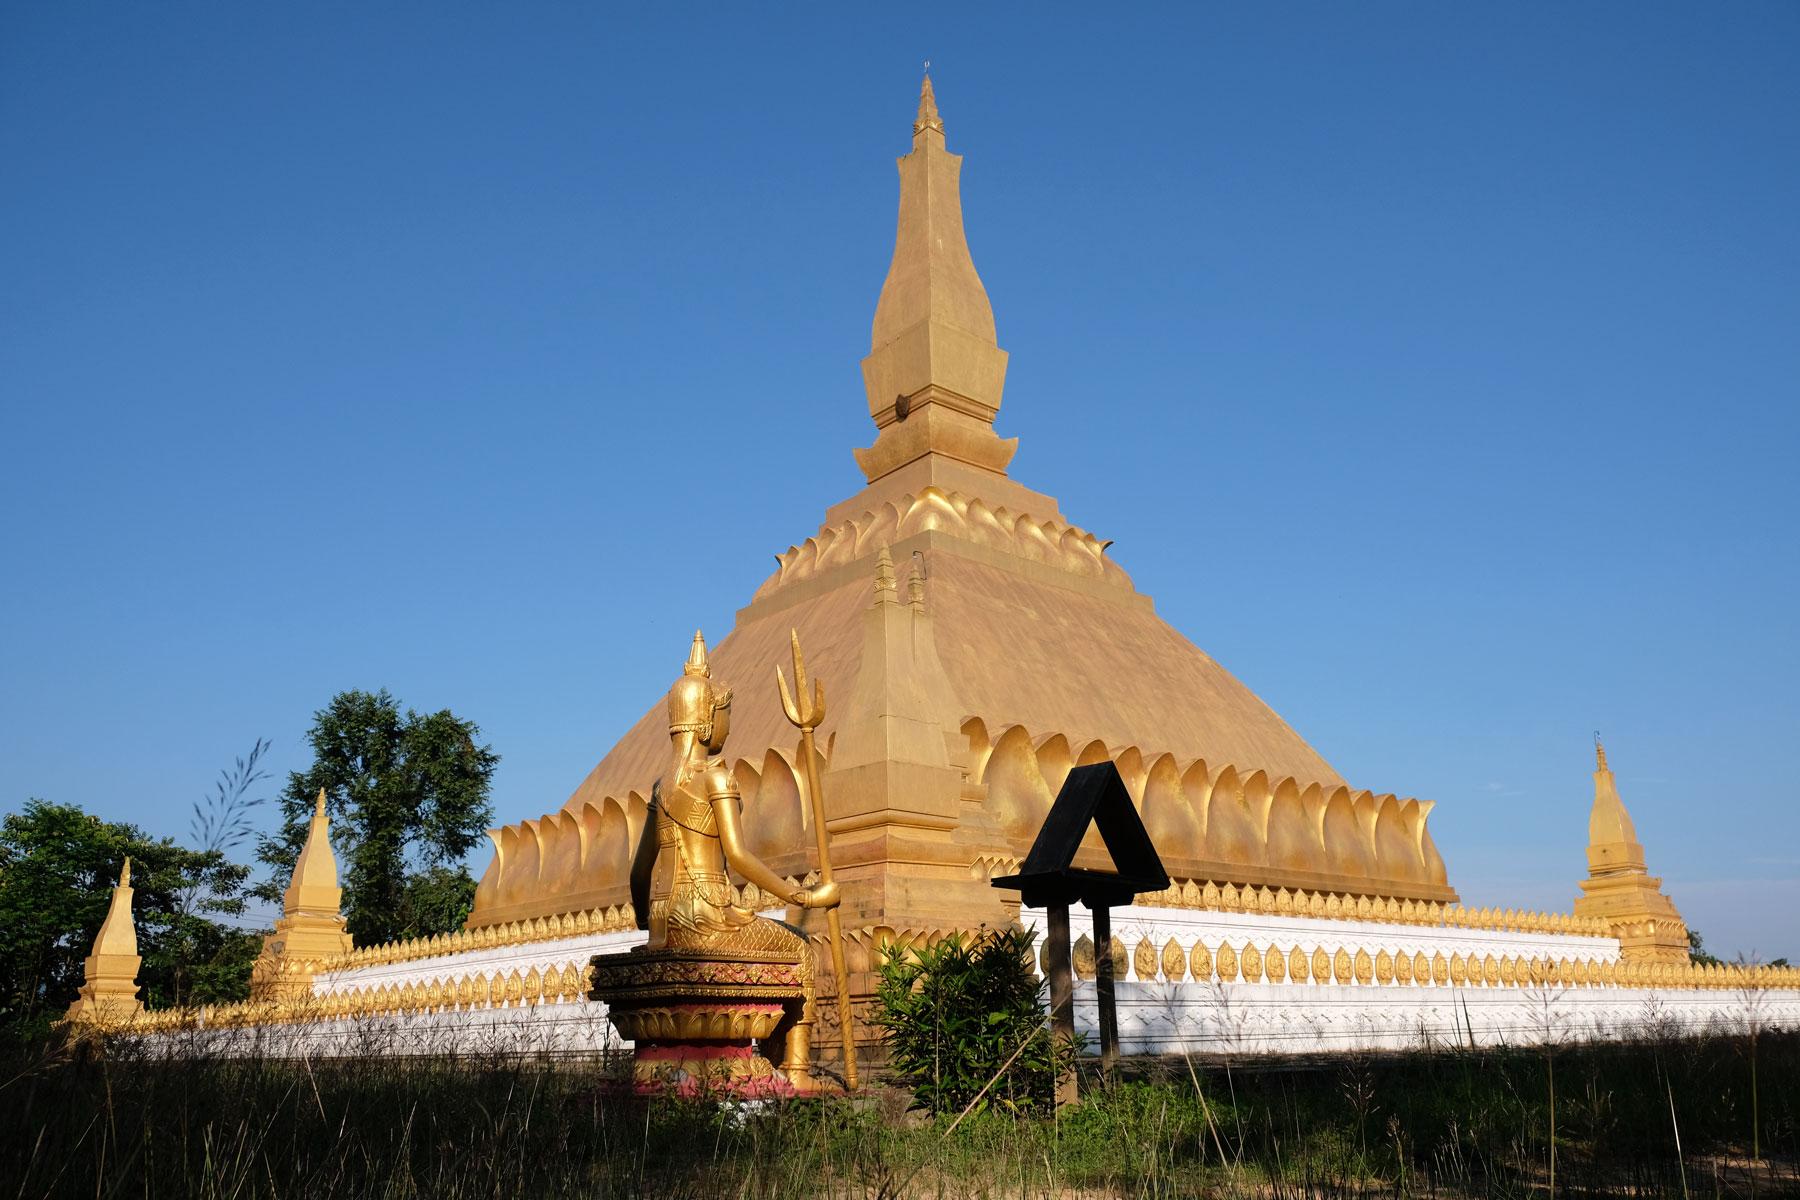 Die War Samakeexay Stupa in Lunag Namtha.